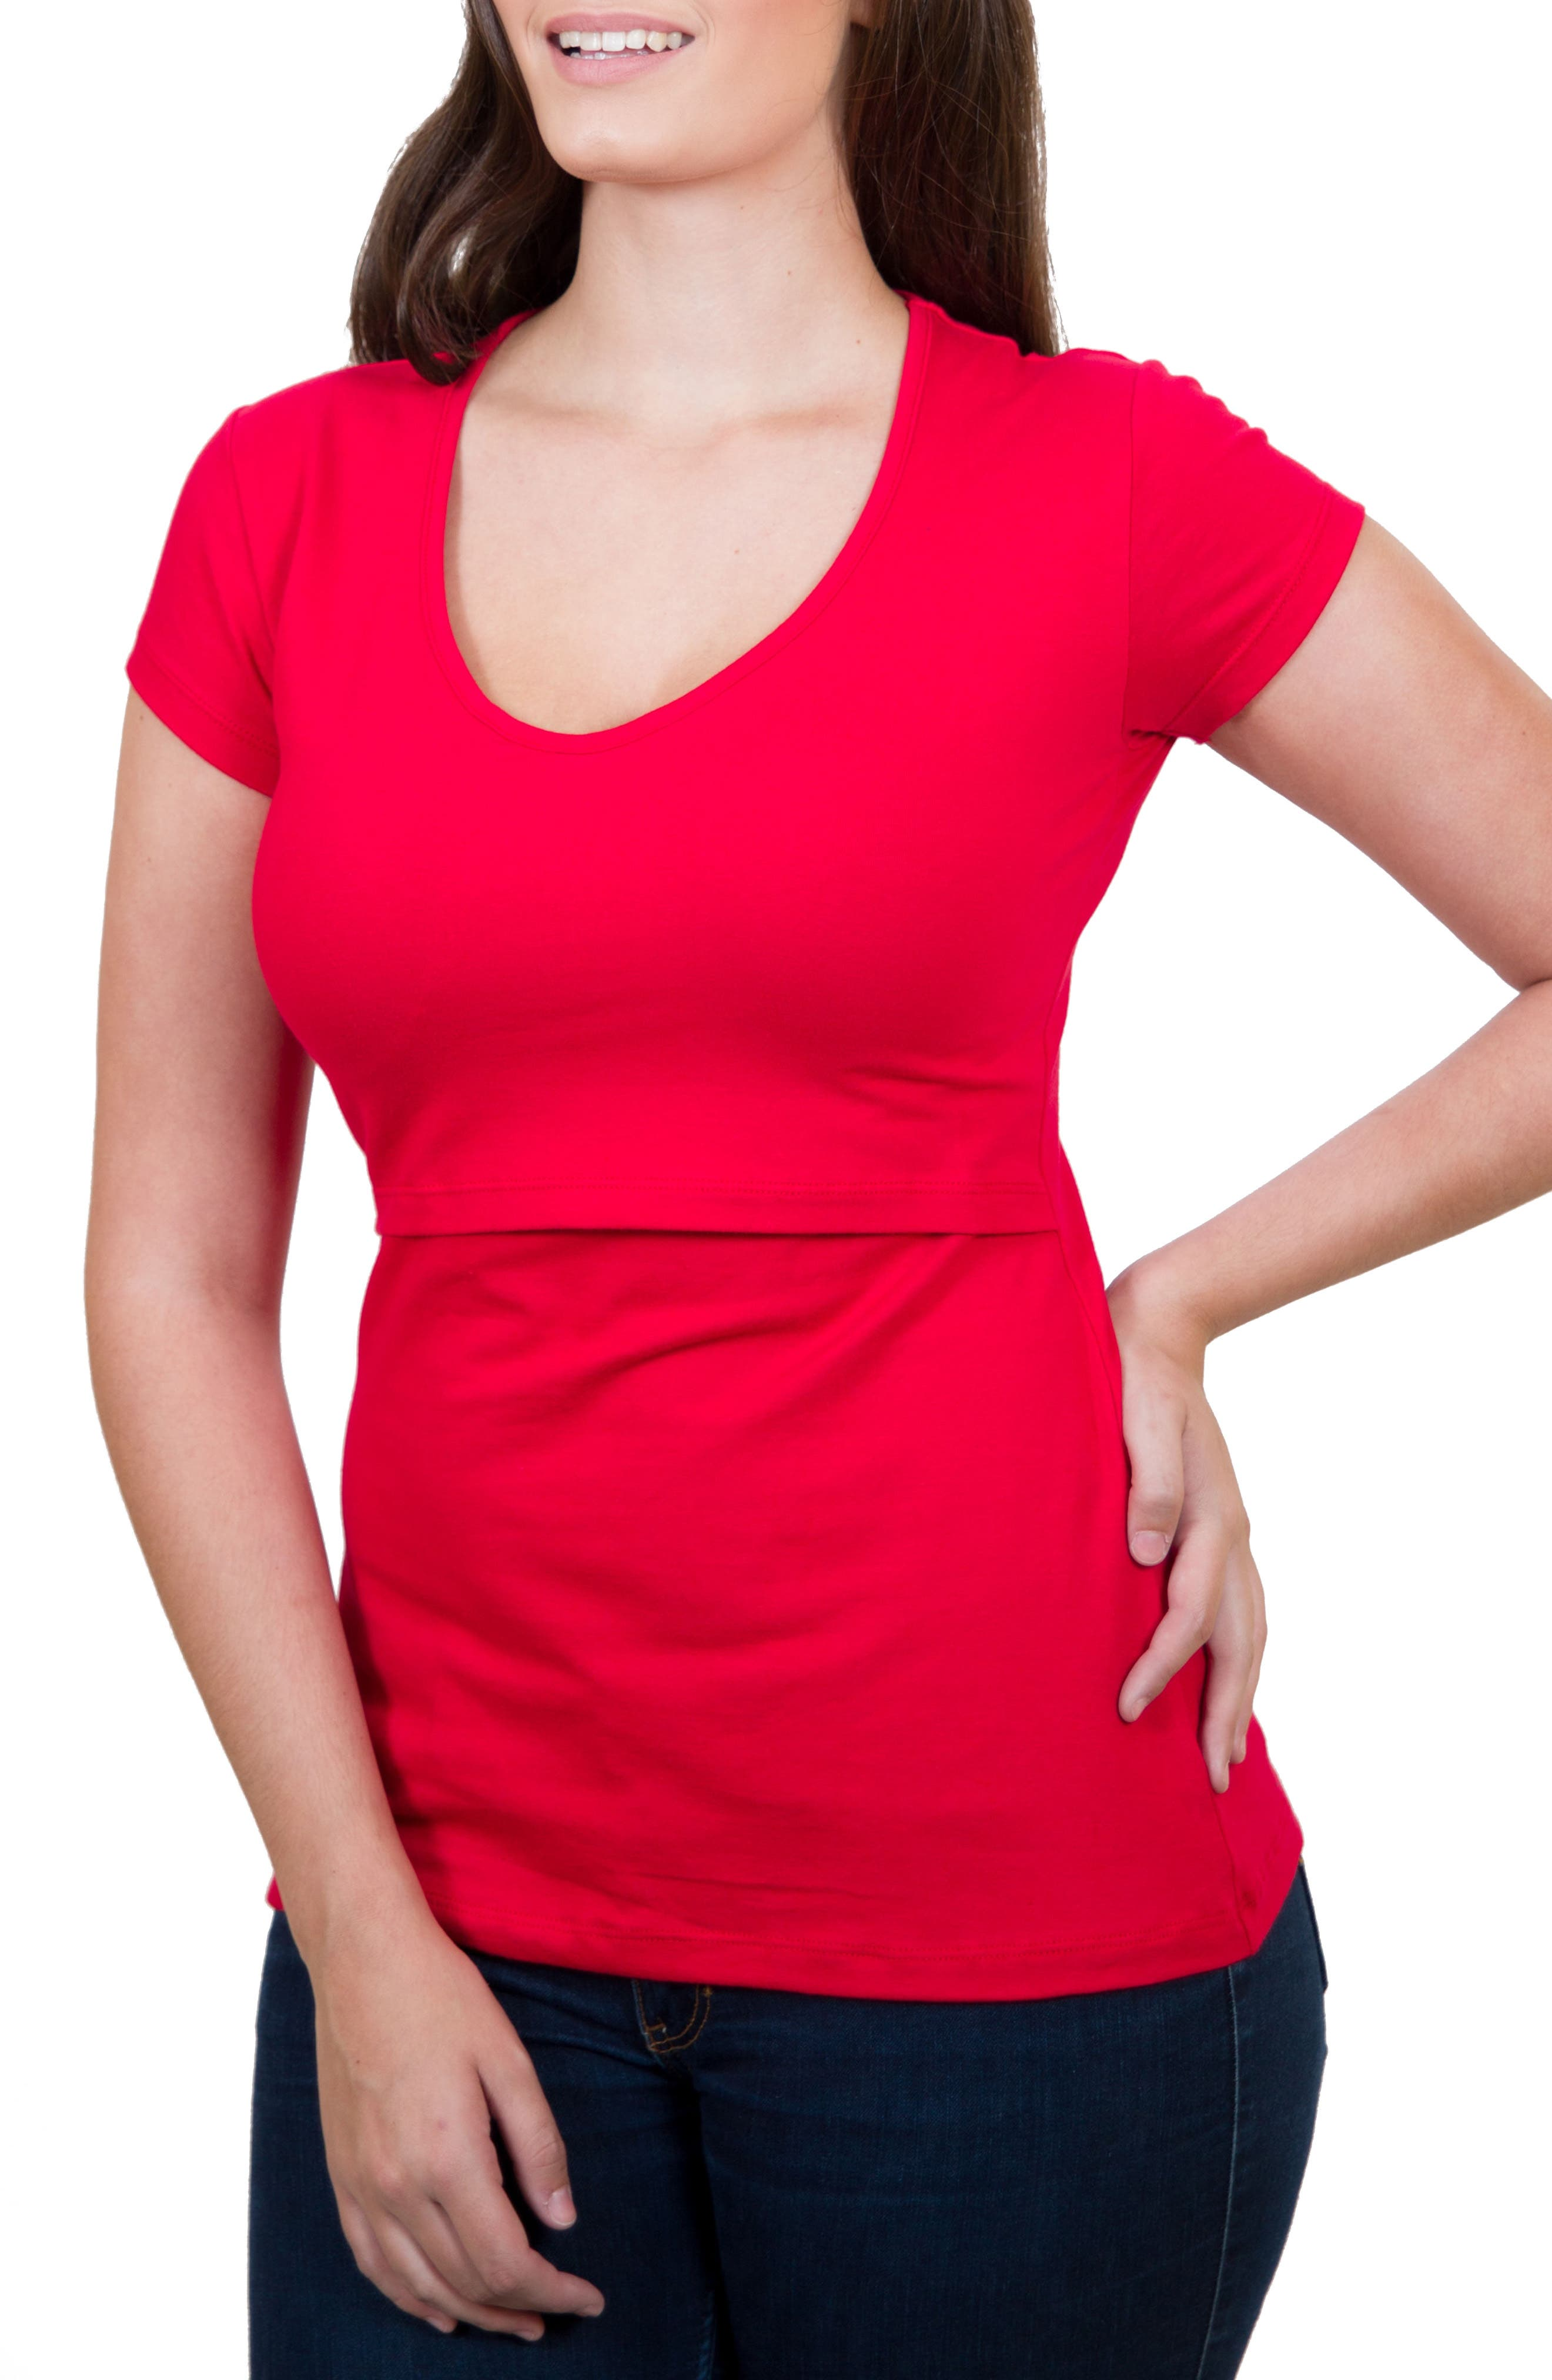 Nurture-Elle Mamawear V-Neck Nursing Top